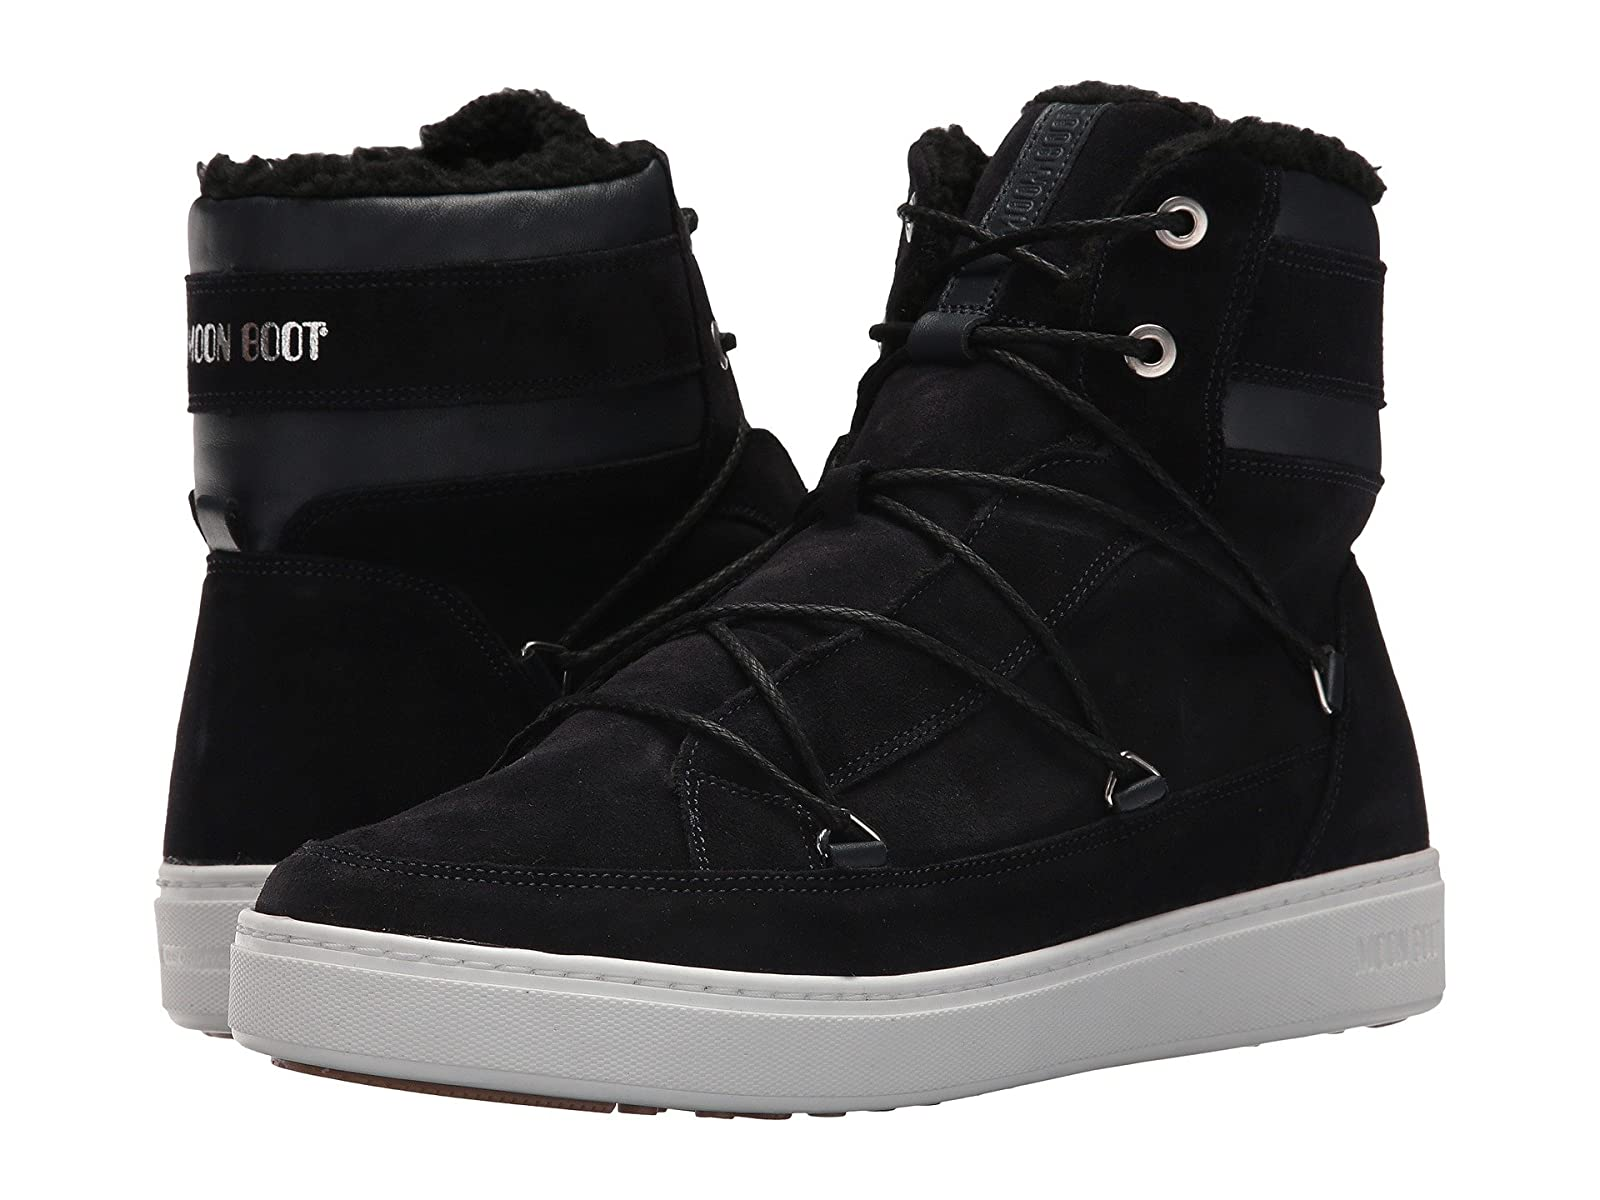 Tecnica Moon Boot Mercury High ParisCheap and distinctive eye-catching shoes